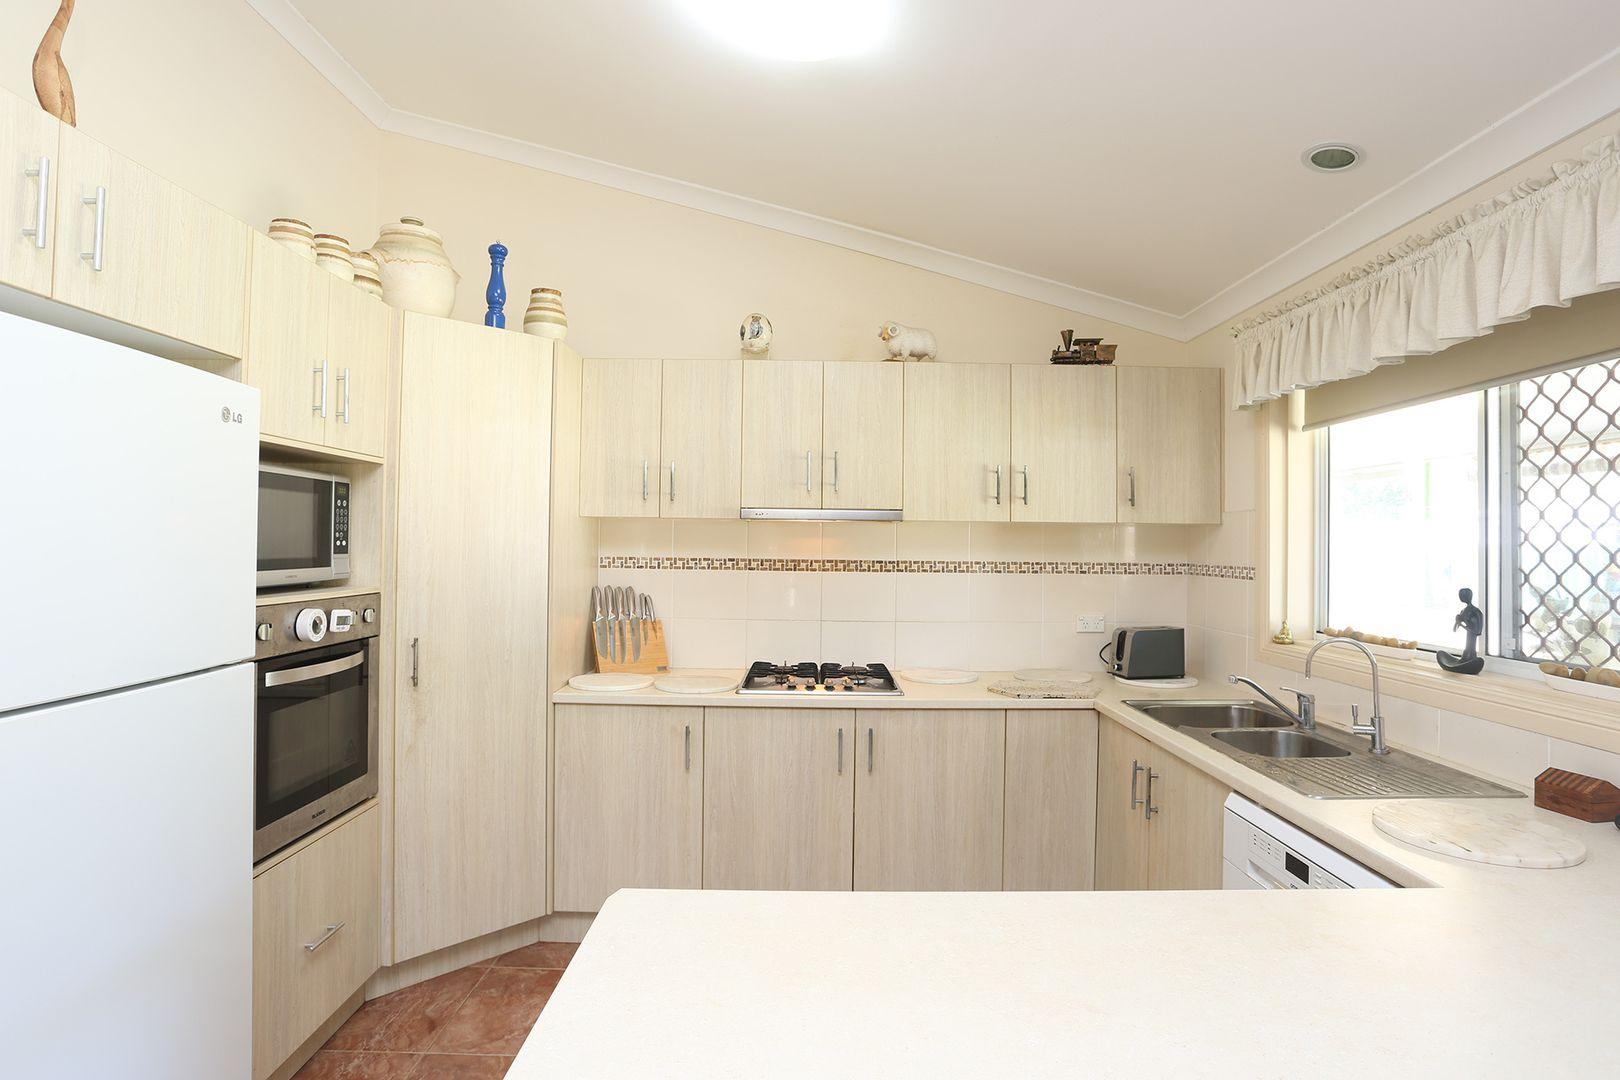 9 ESK Caravan Park 16 Hassall street, Esk QLD 4312, Image 1